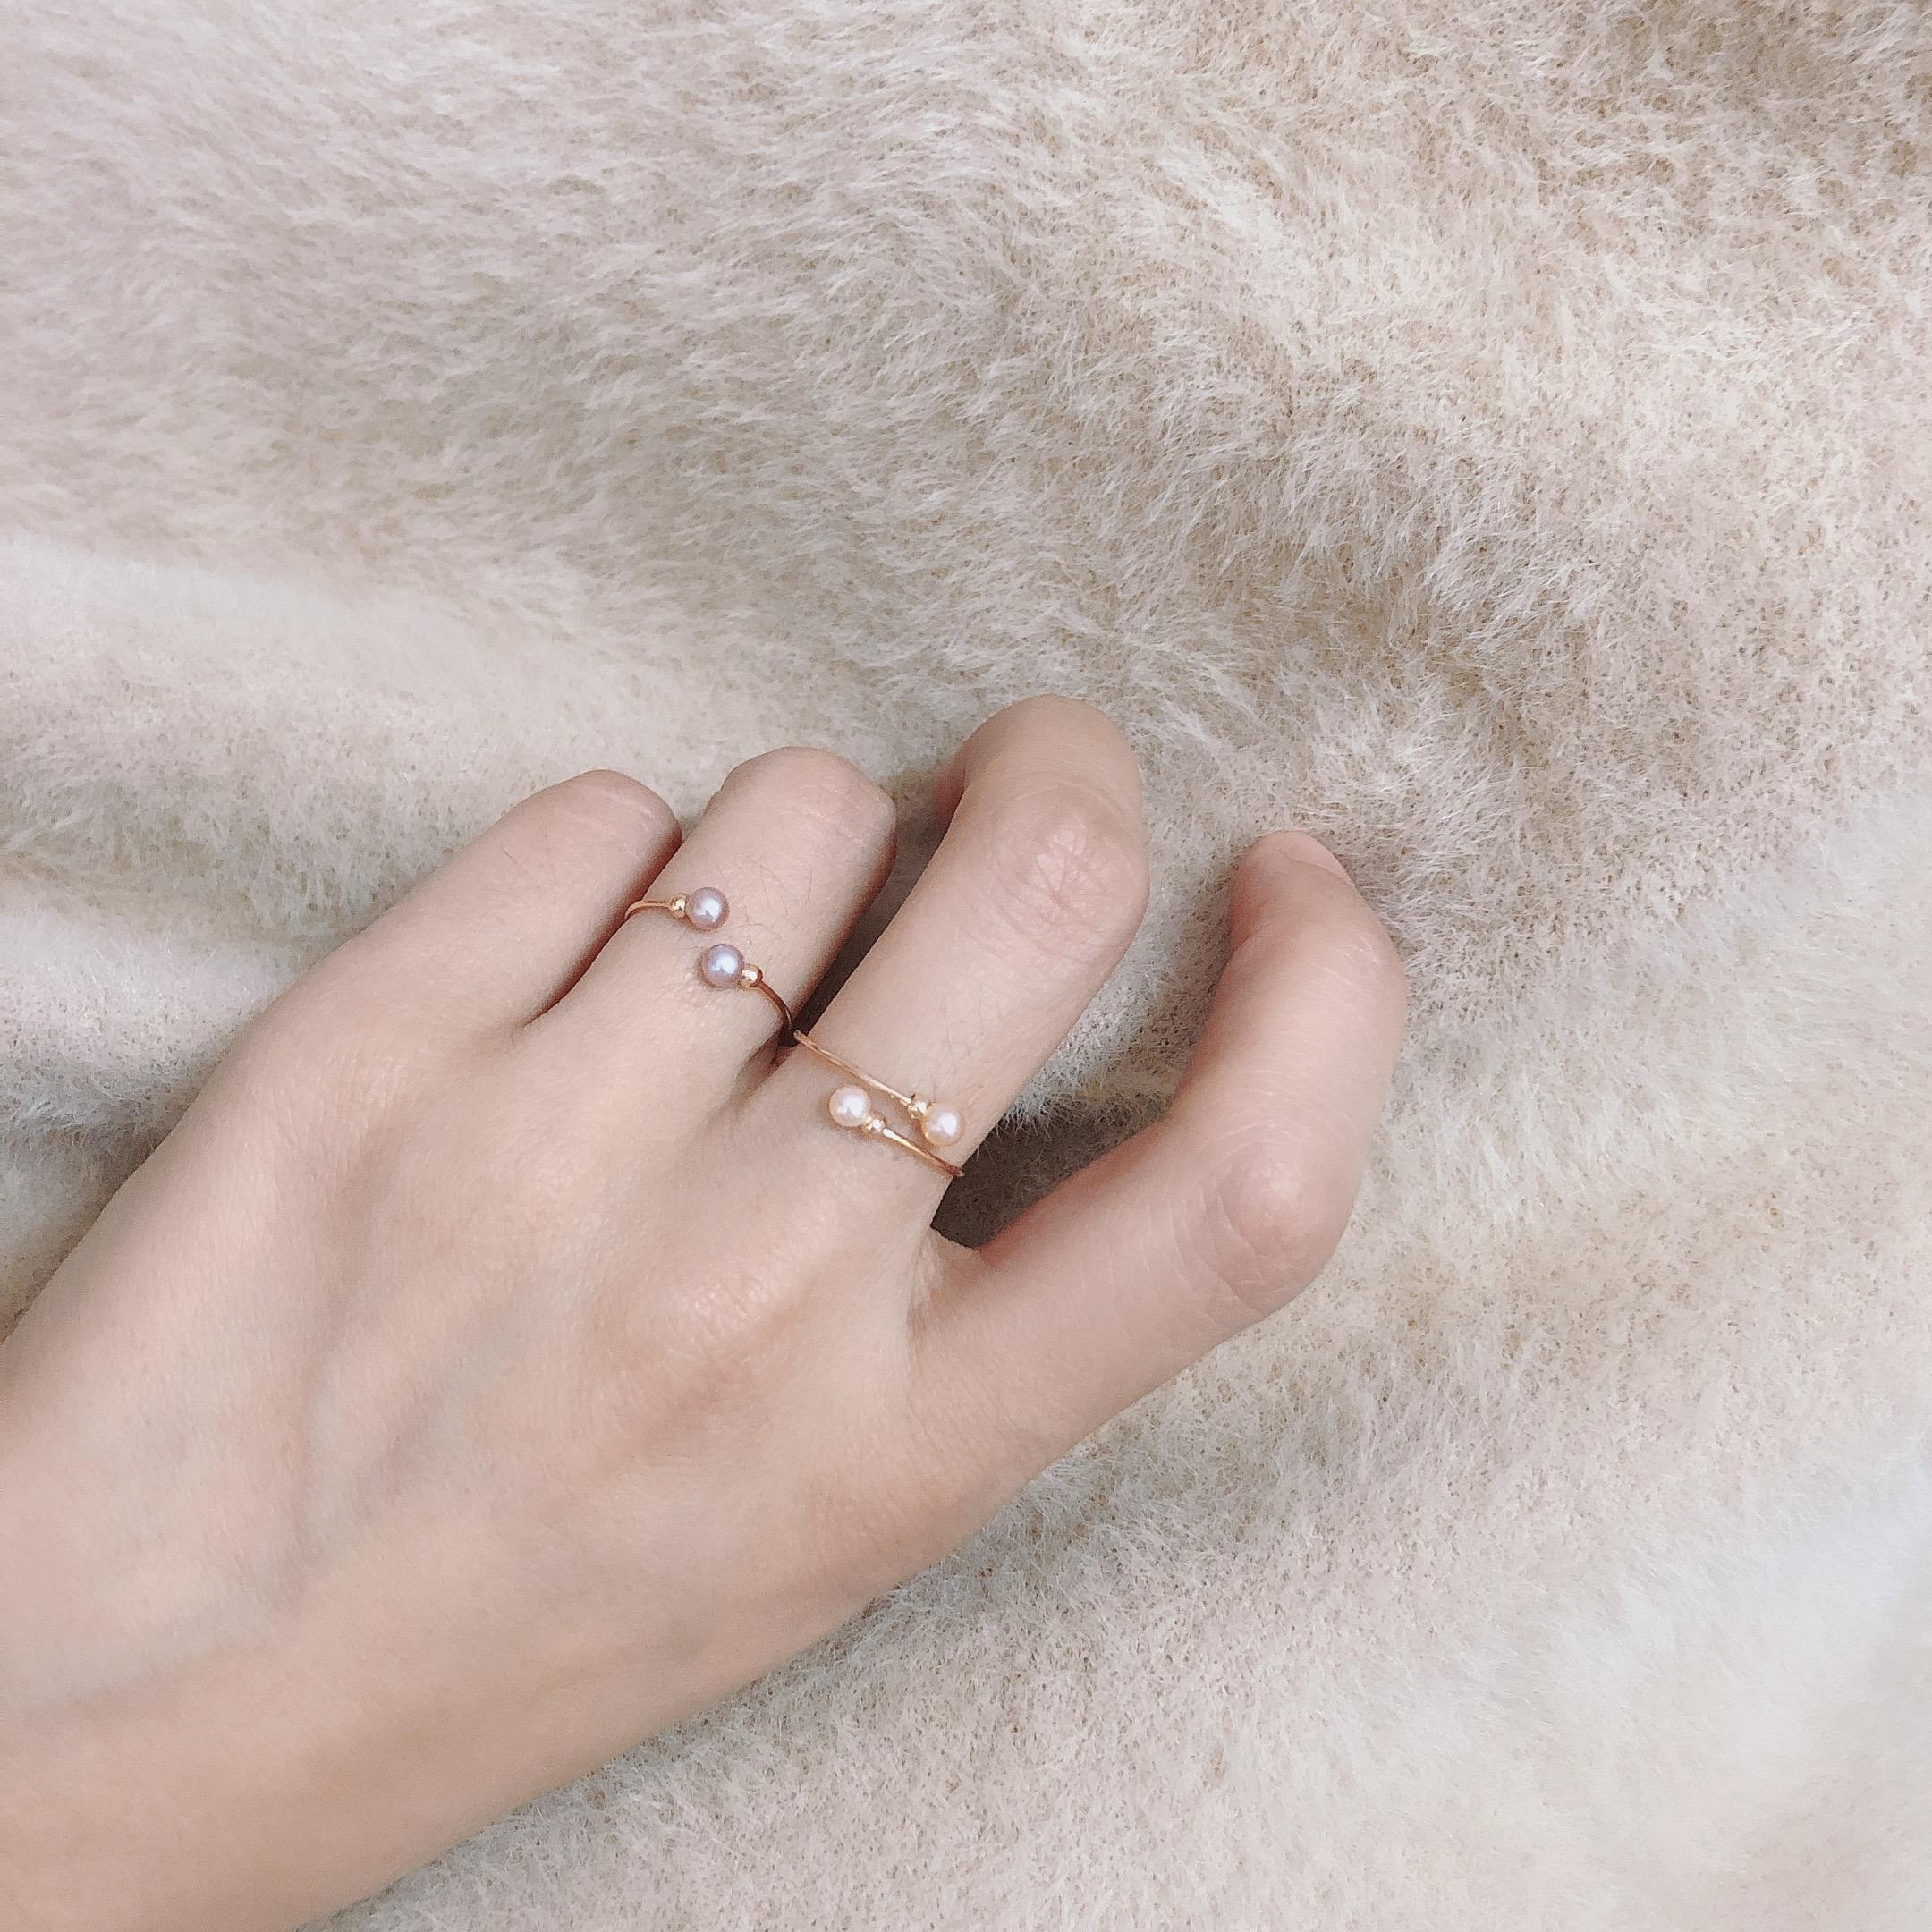 Time定制简约小众设计绕线14k金天然小珍珠可调节开口女戒指尾戒